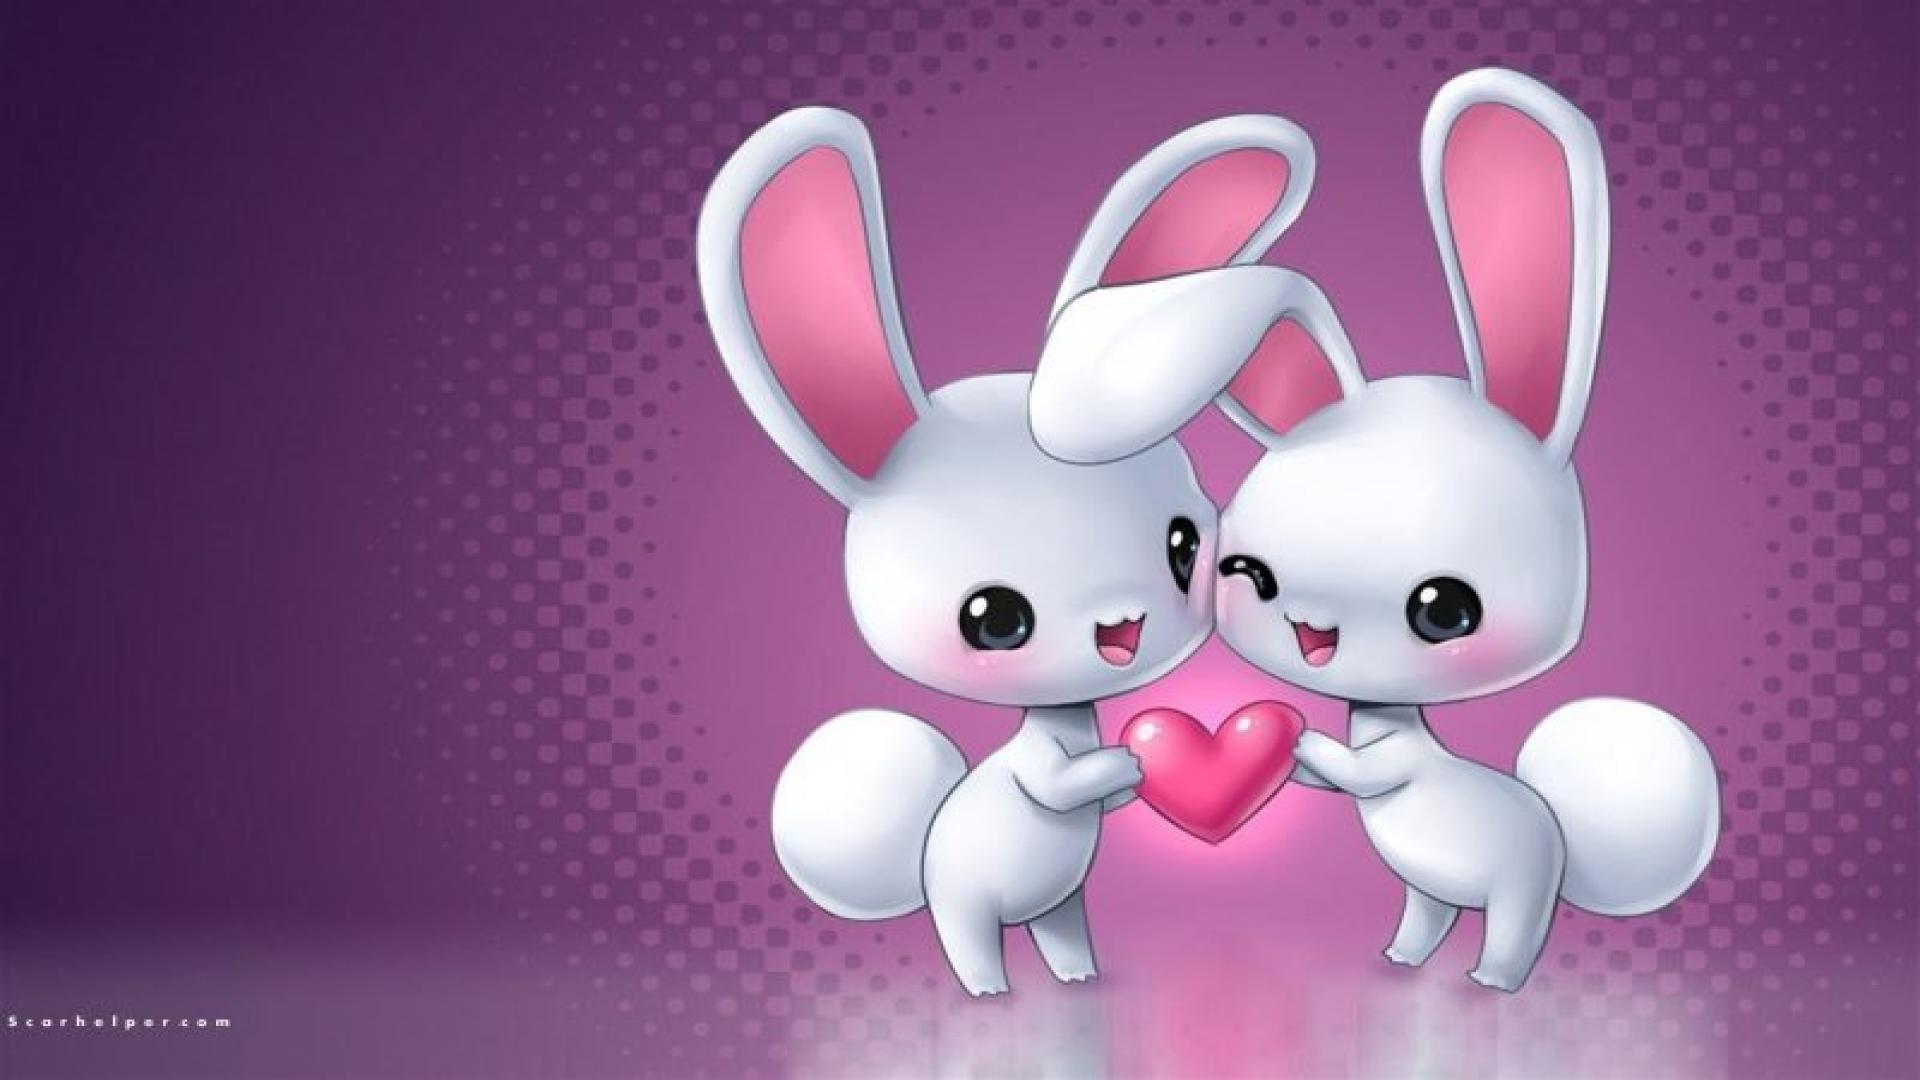 Beautiful Love Wallpapers For Mobile - Love Cartoon - HD Wallpaper